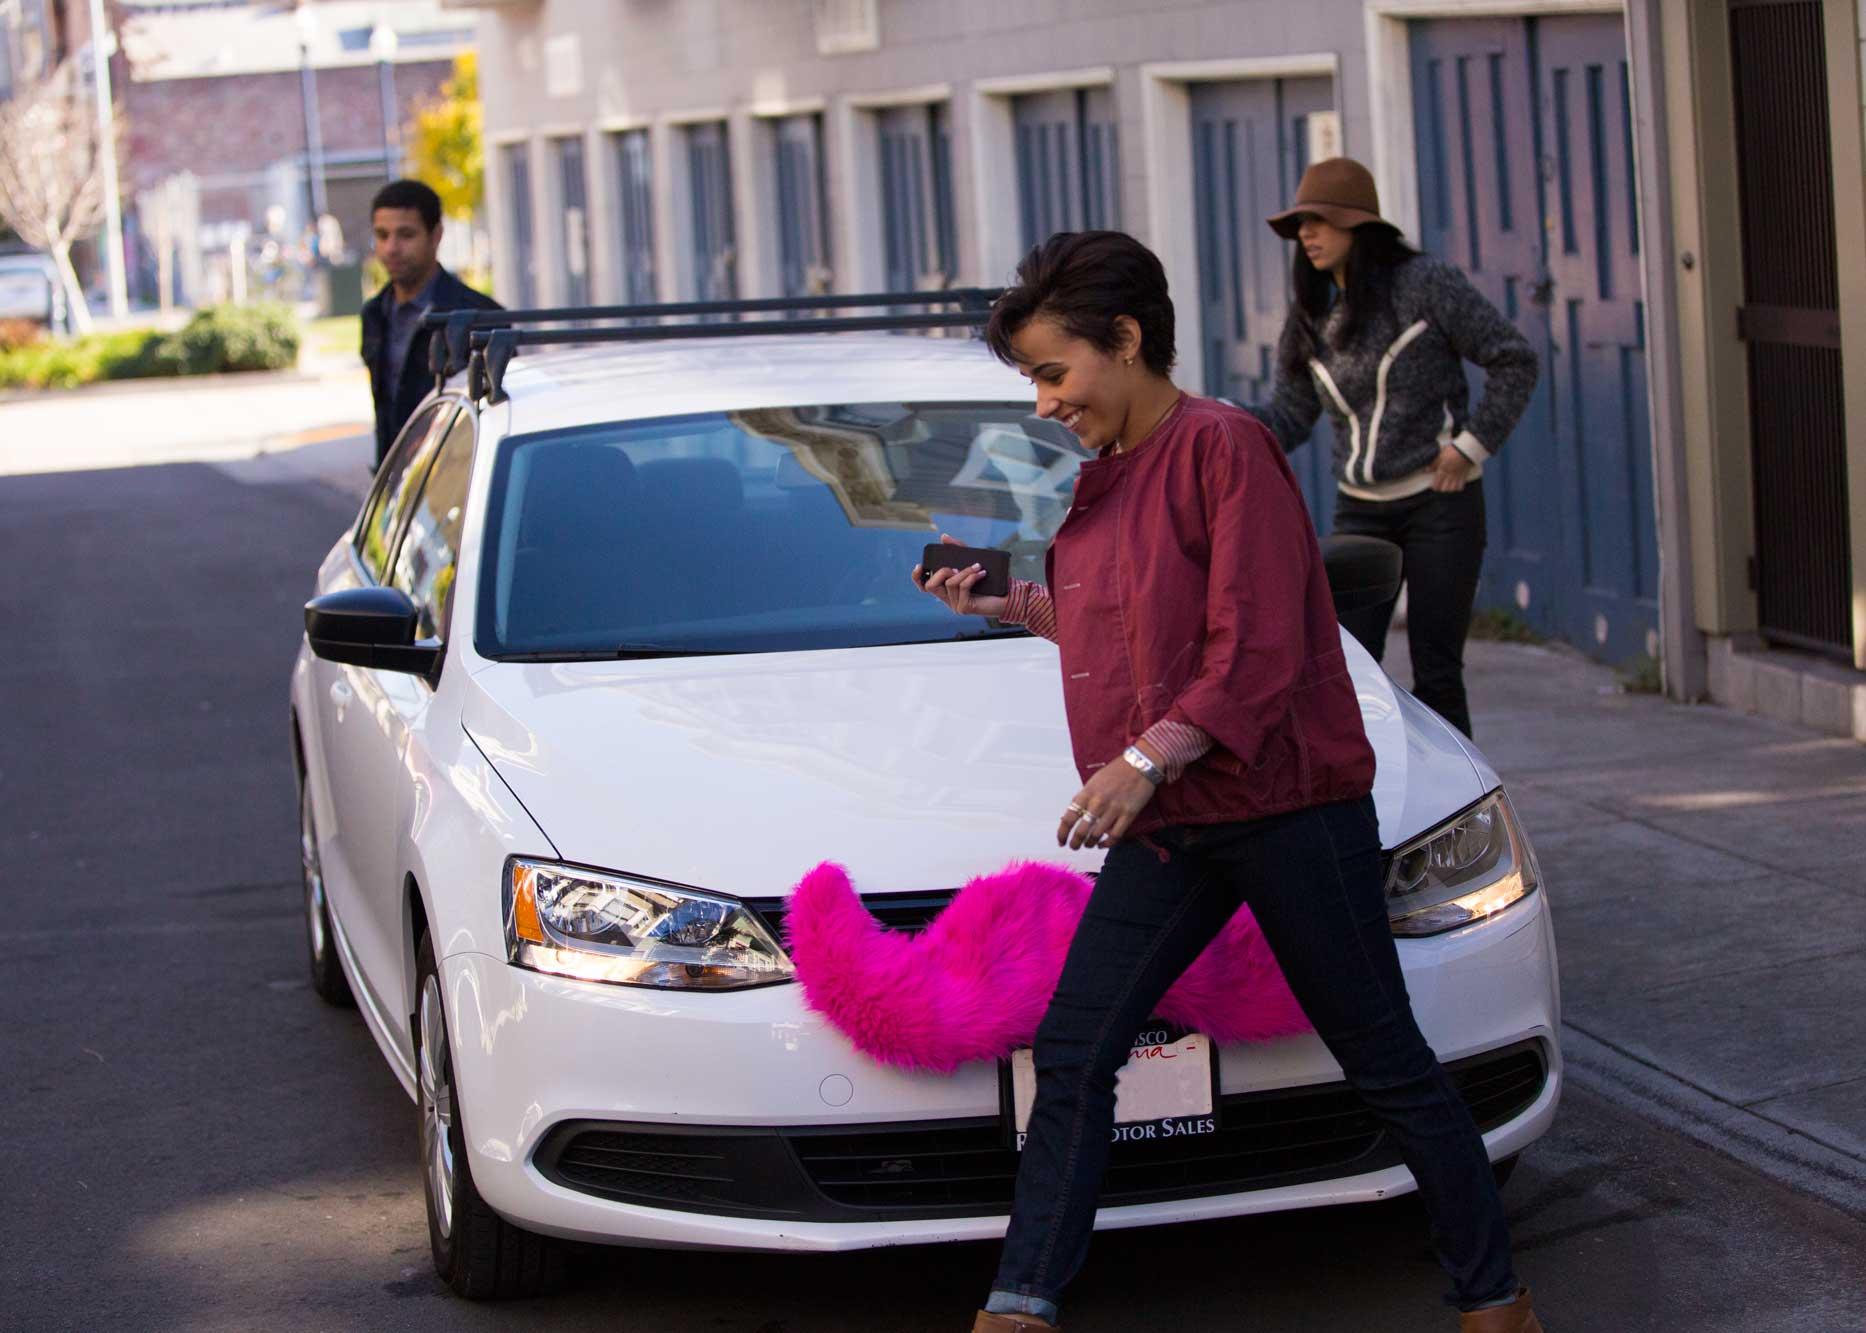 Rideshare App Lyft Expands to LA, Despite Legal Threat